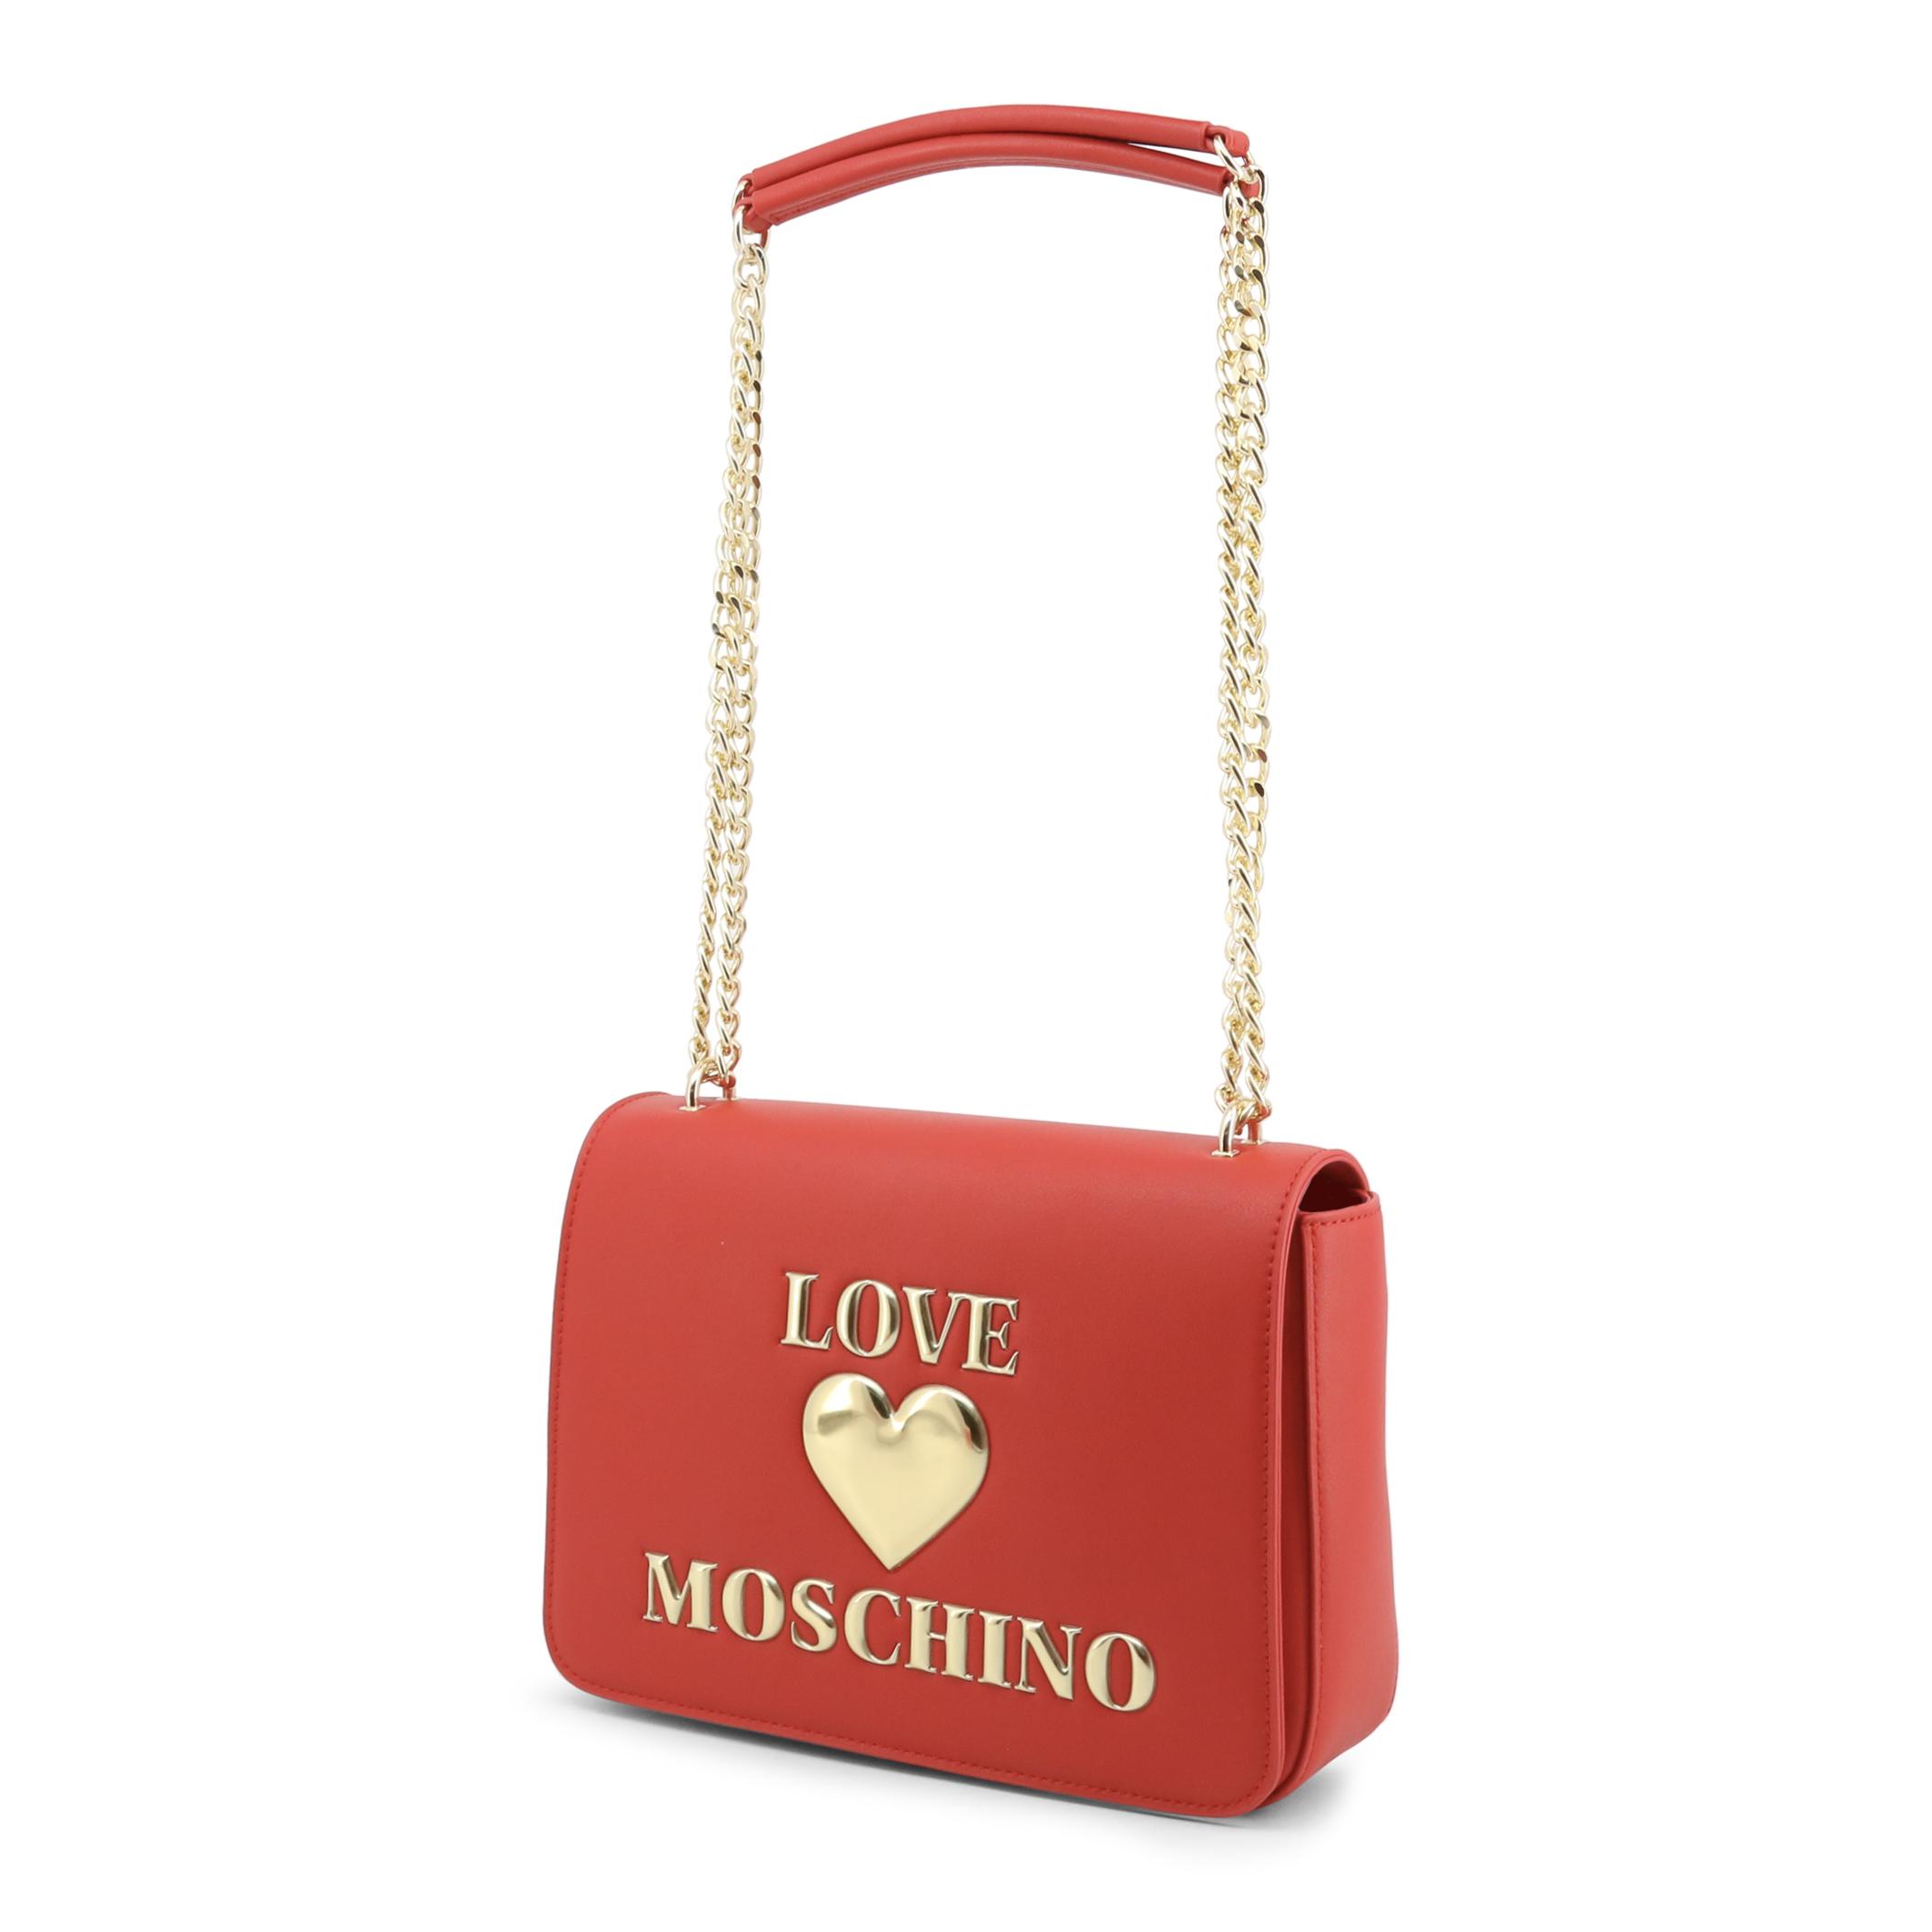 Sac porté épaule  Love moschino JC4035PP1BLE_0500 red